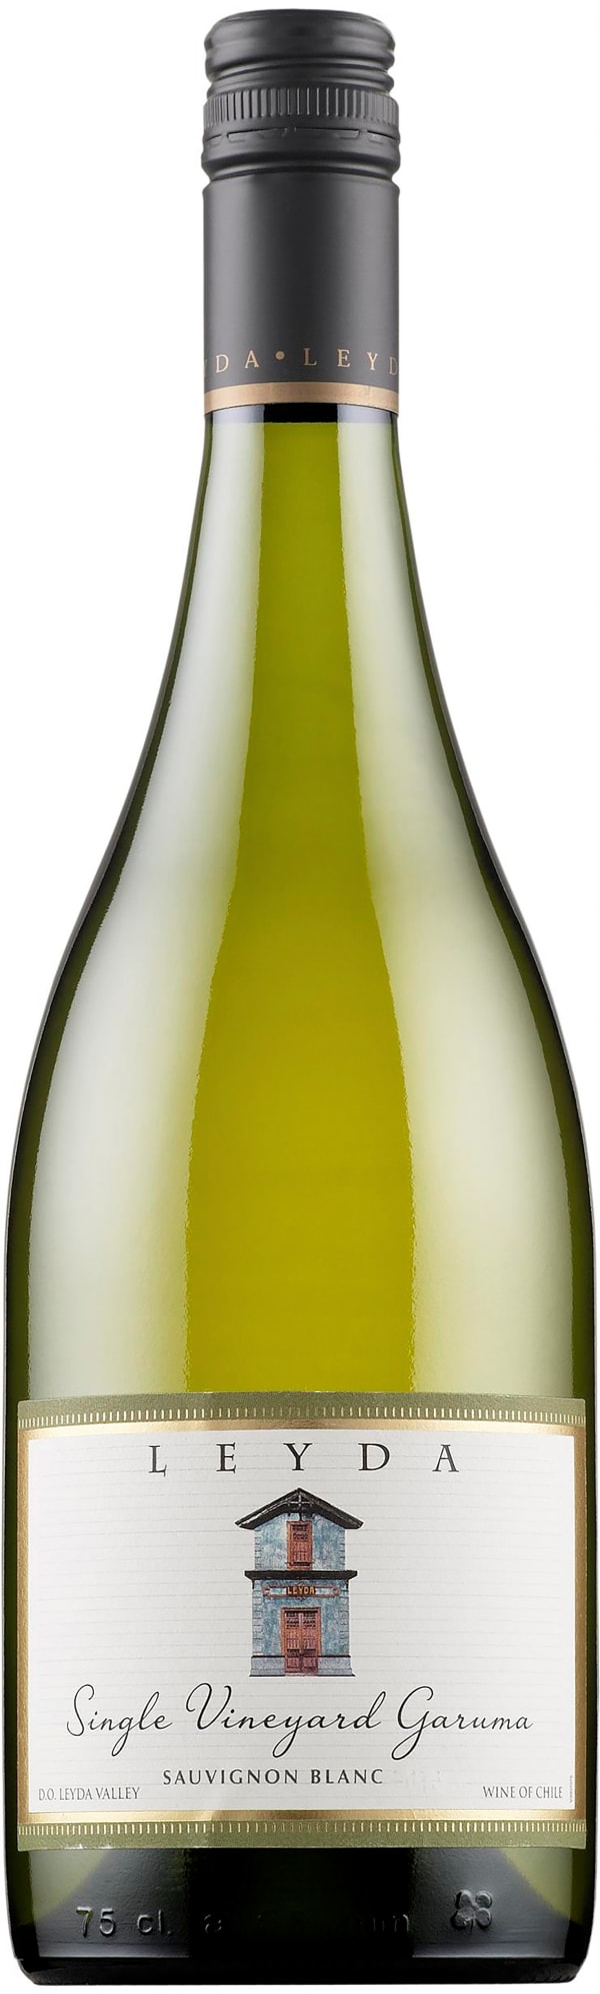 Leyda Garuma Vineyard Sauvignon Blanc 2019